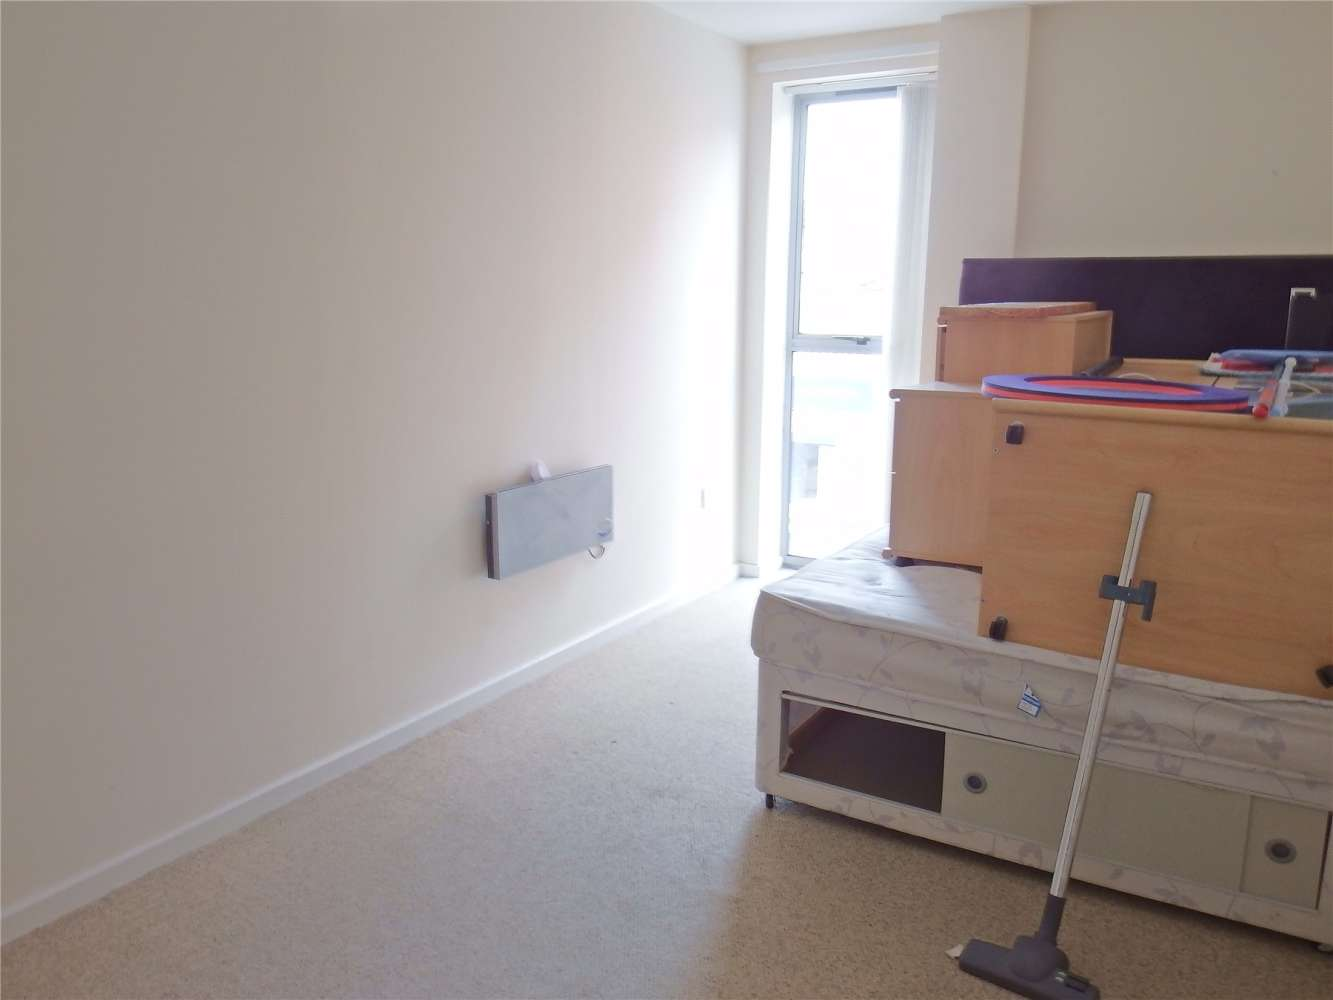 Apartment Leeds, LS2 - Ahlux Court Millwright Street Leeds West Yorkshire - 02